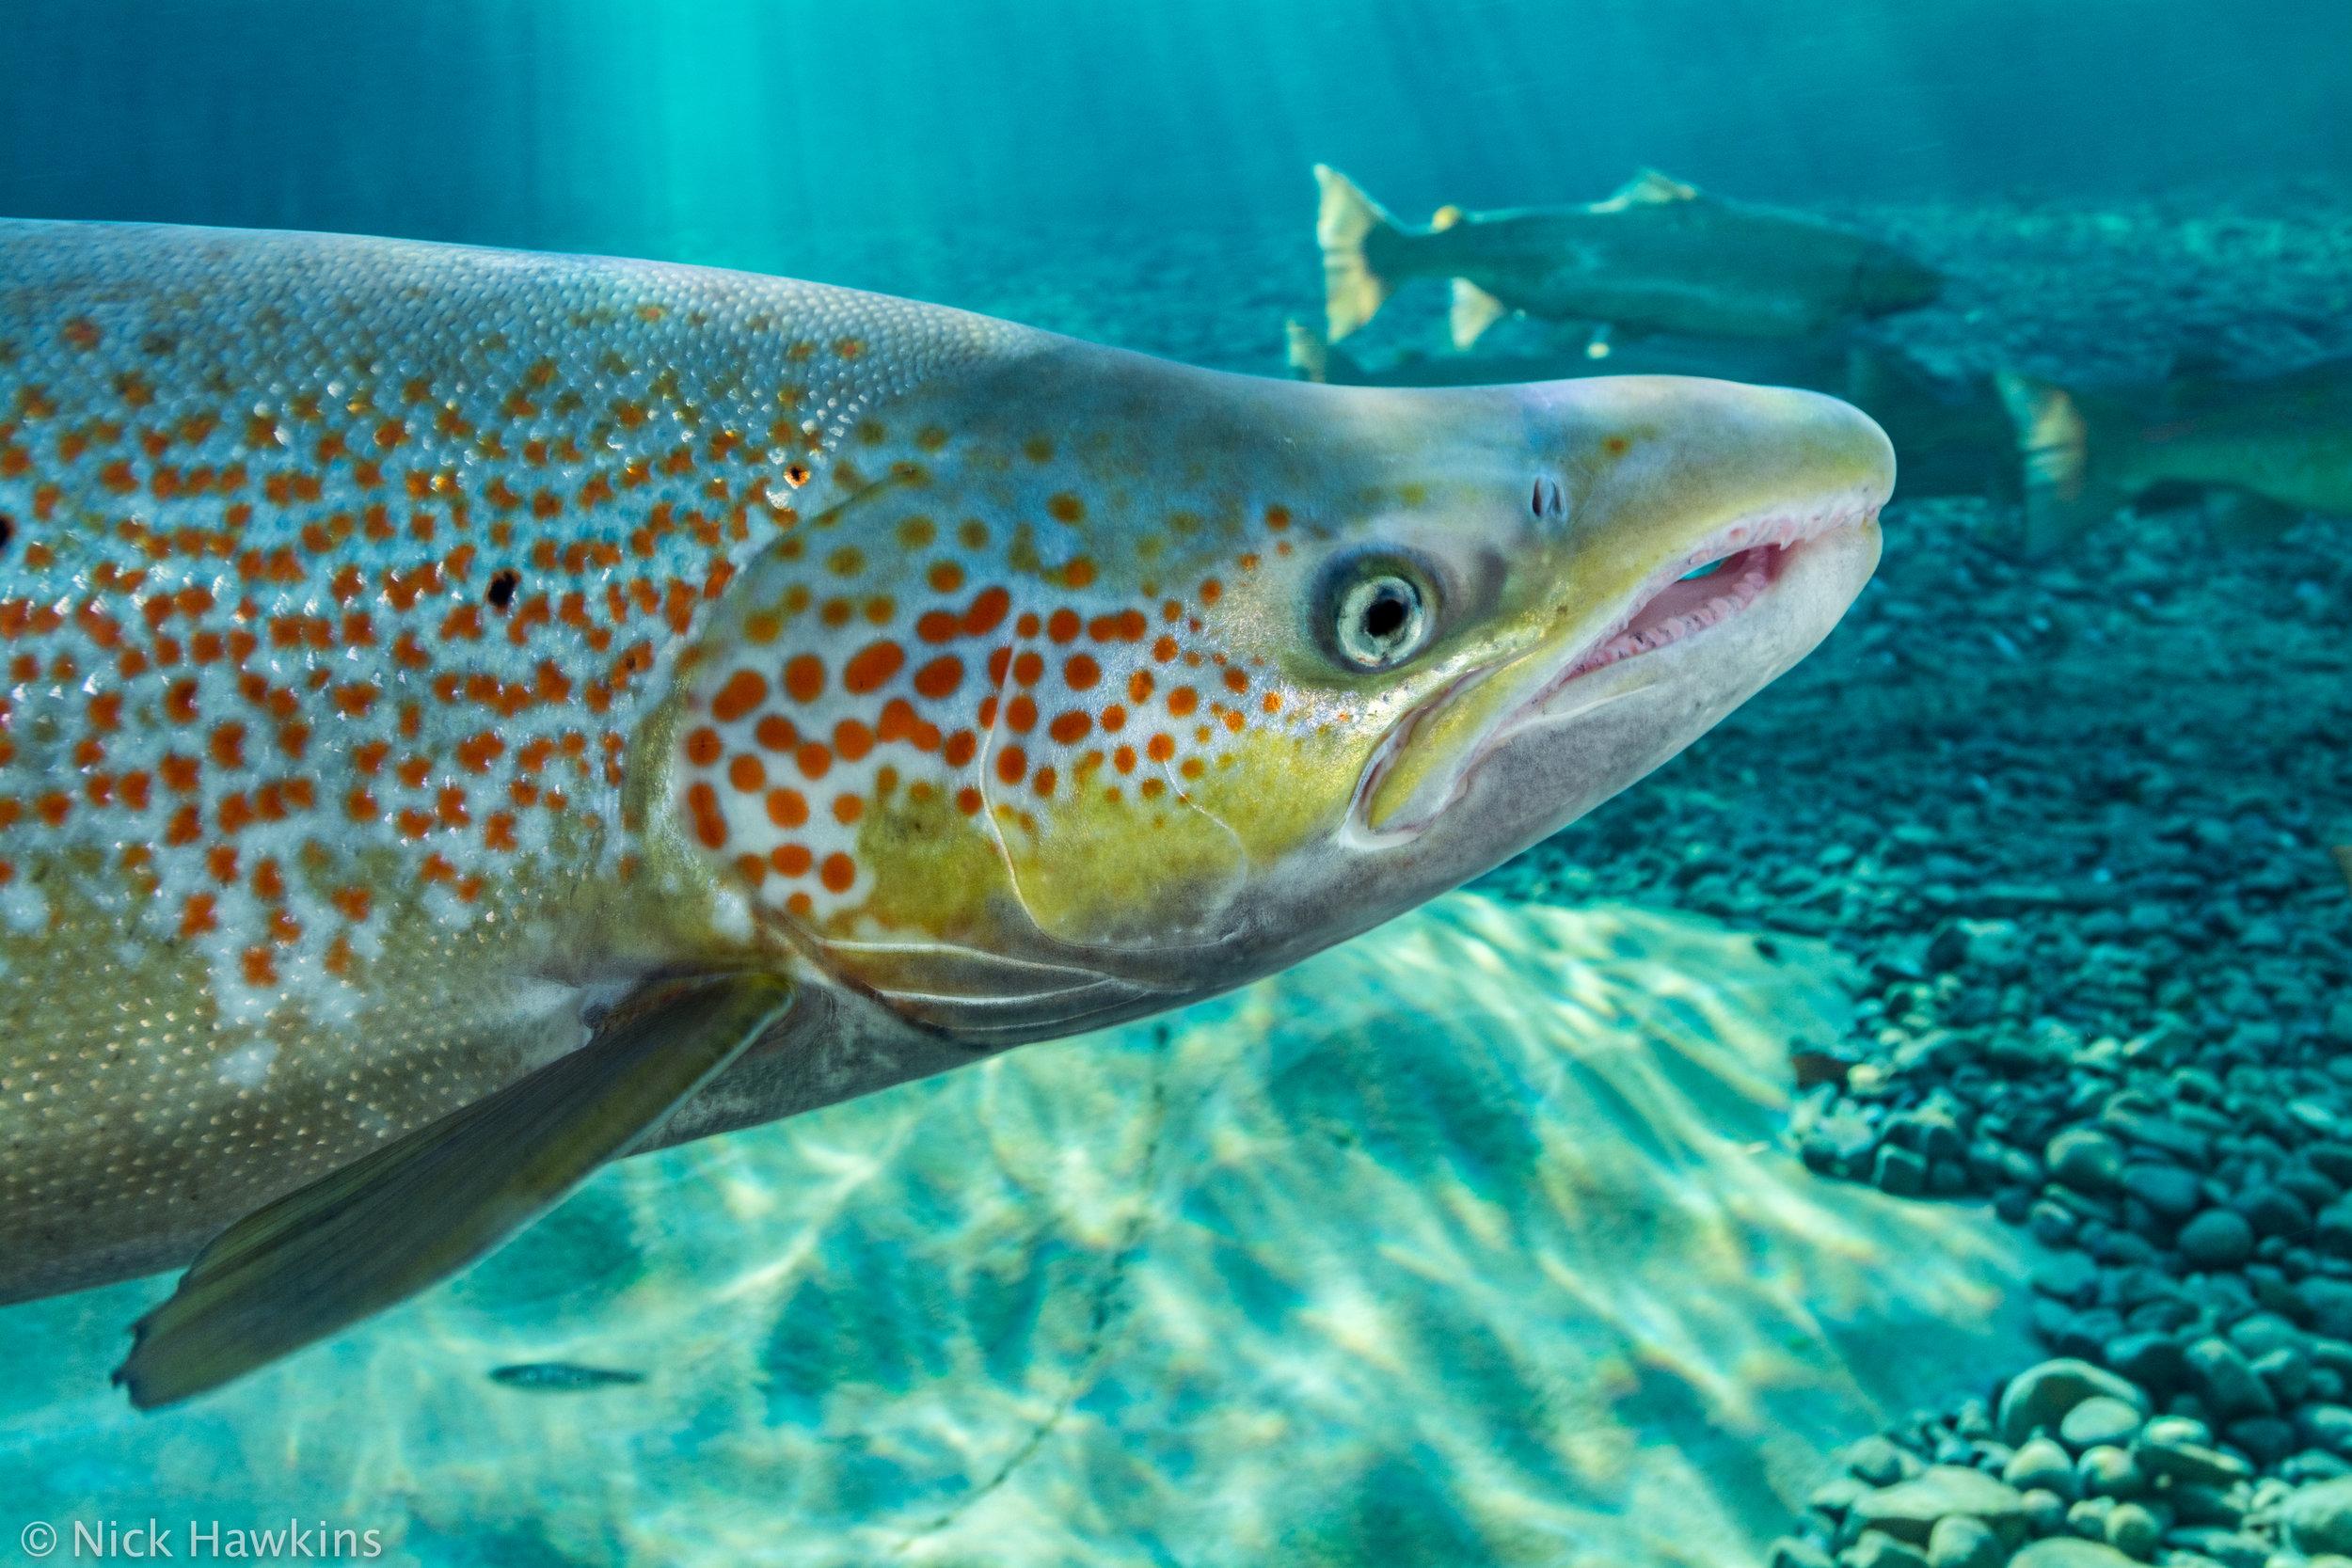 Gaspé-Saving-Salmon-Nick-Hawkins-4216.jpg